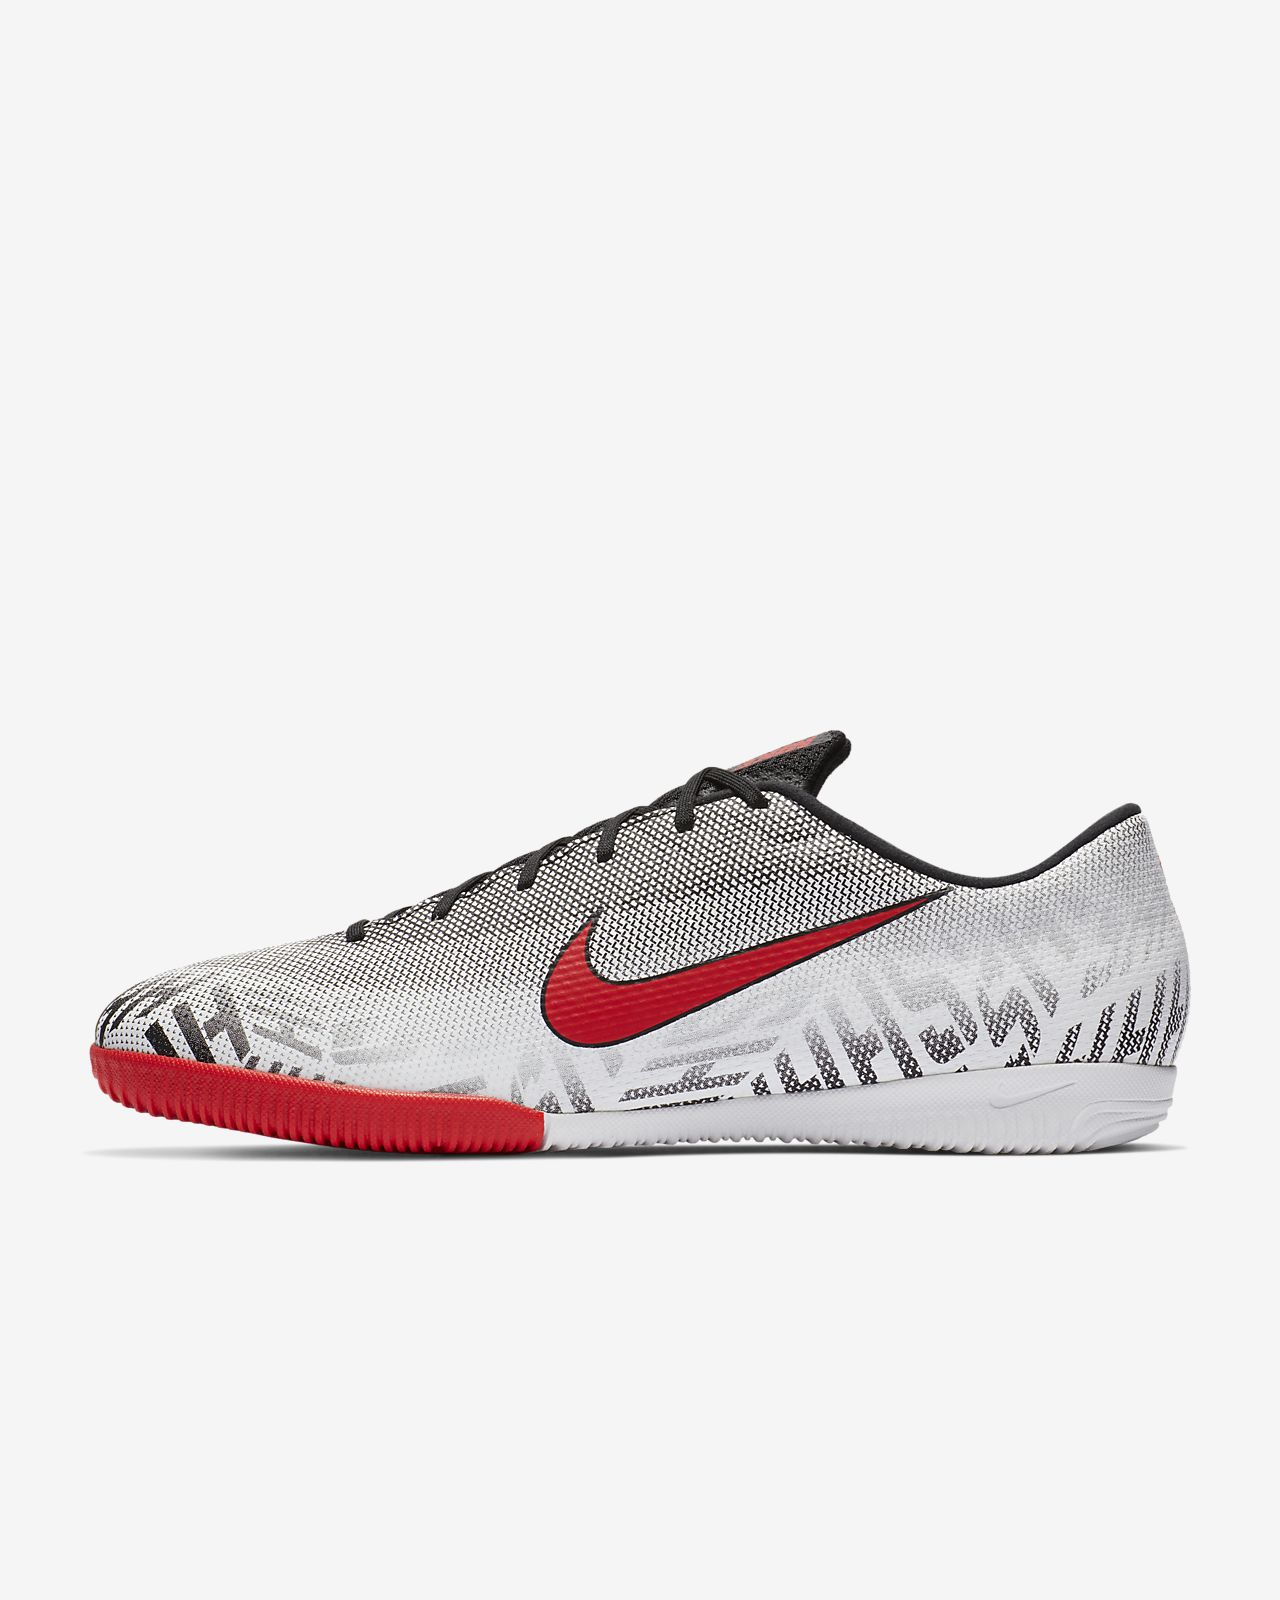 buy online 222ca af0a1 ... Nike Mercurial Vapor XII Academy Neymar Jr Indoor Court Soccer Shoe